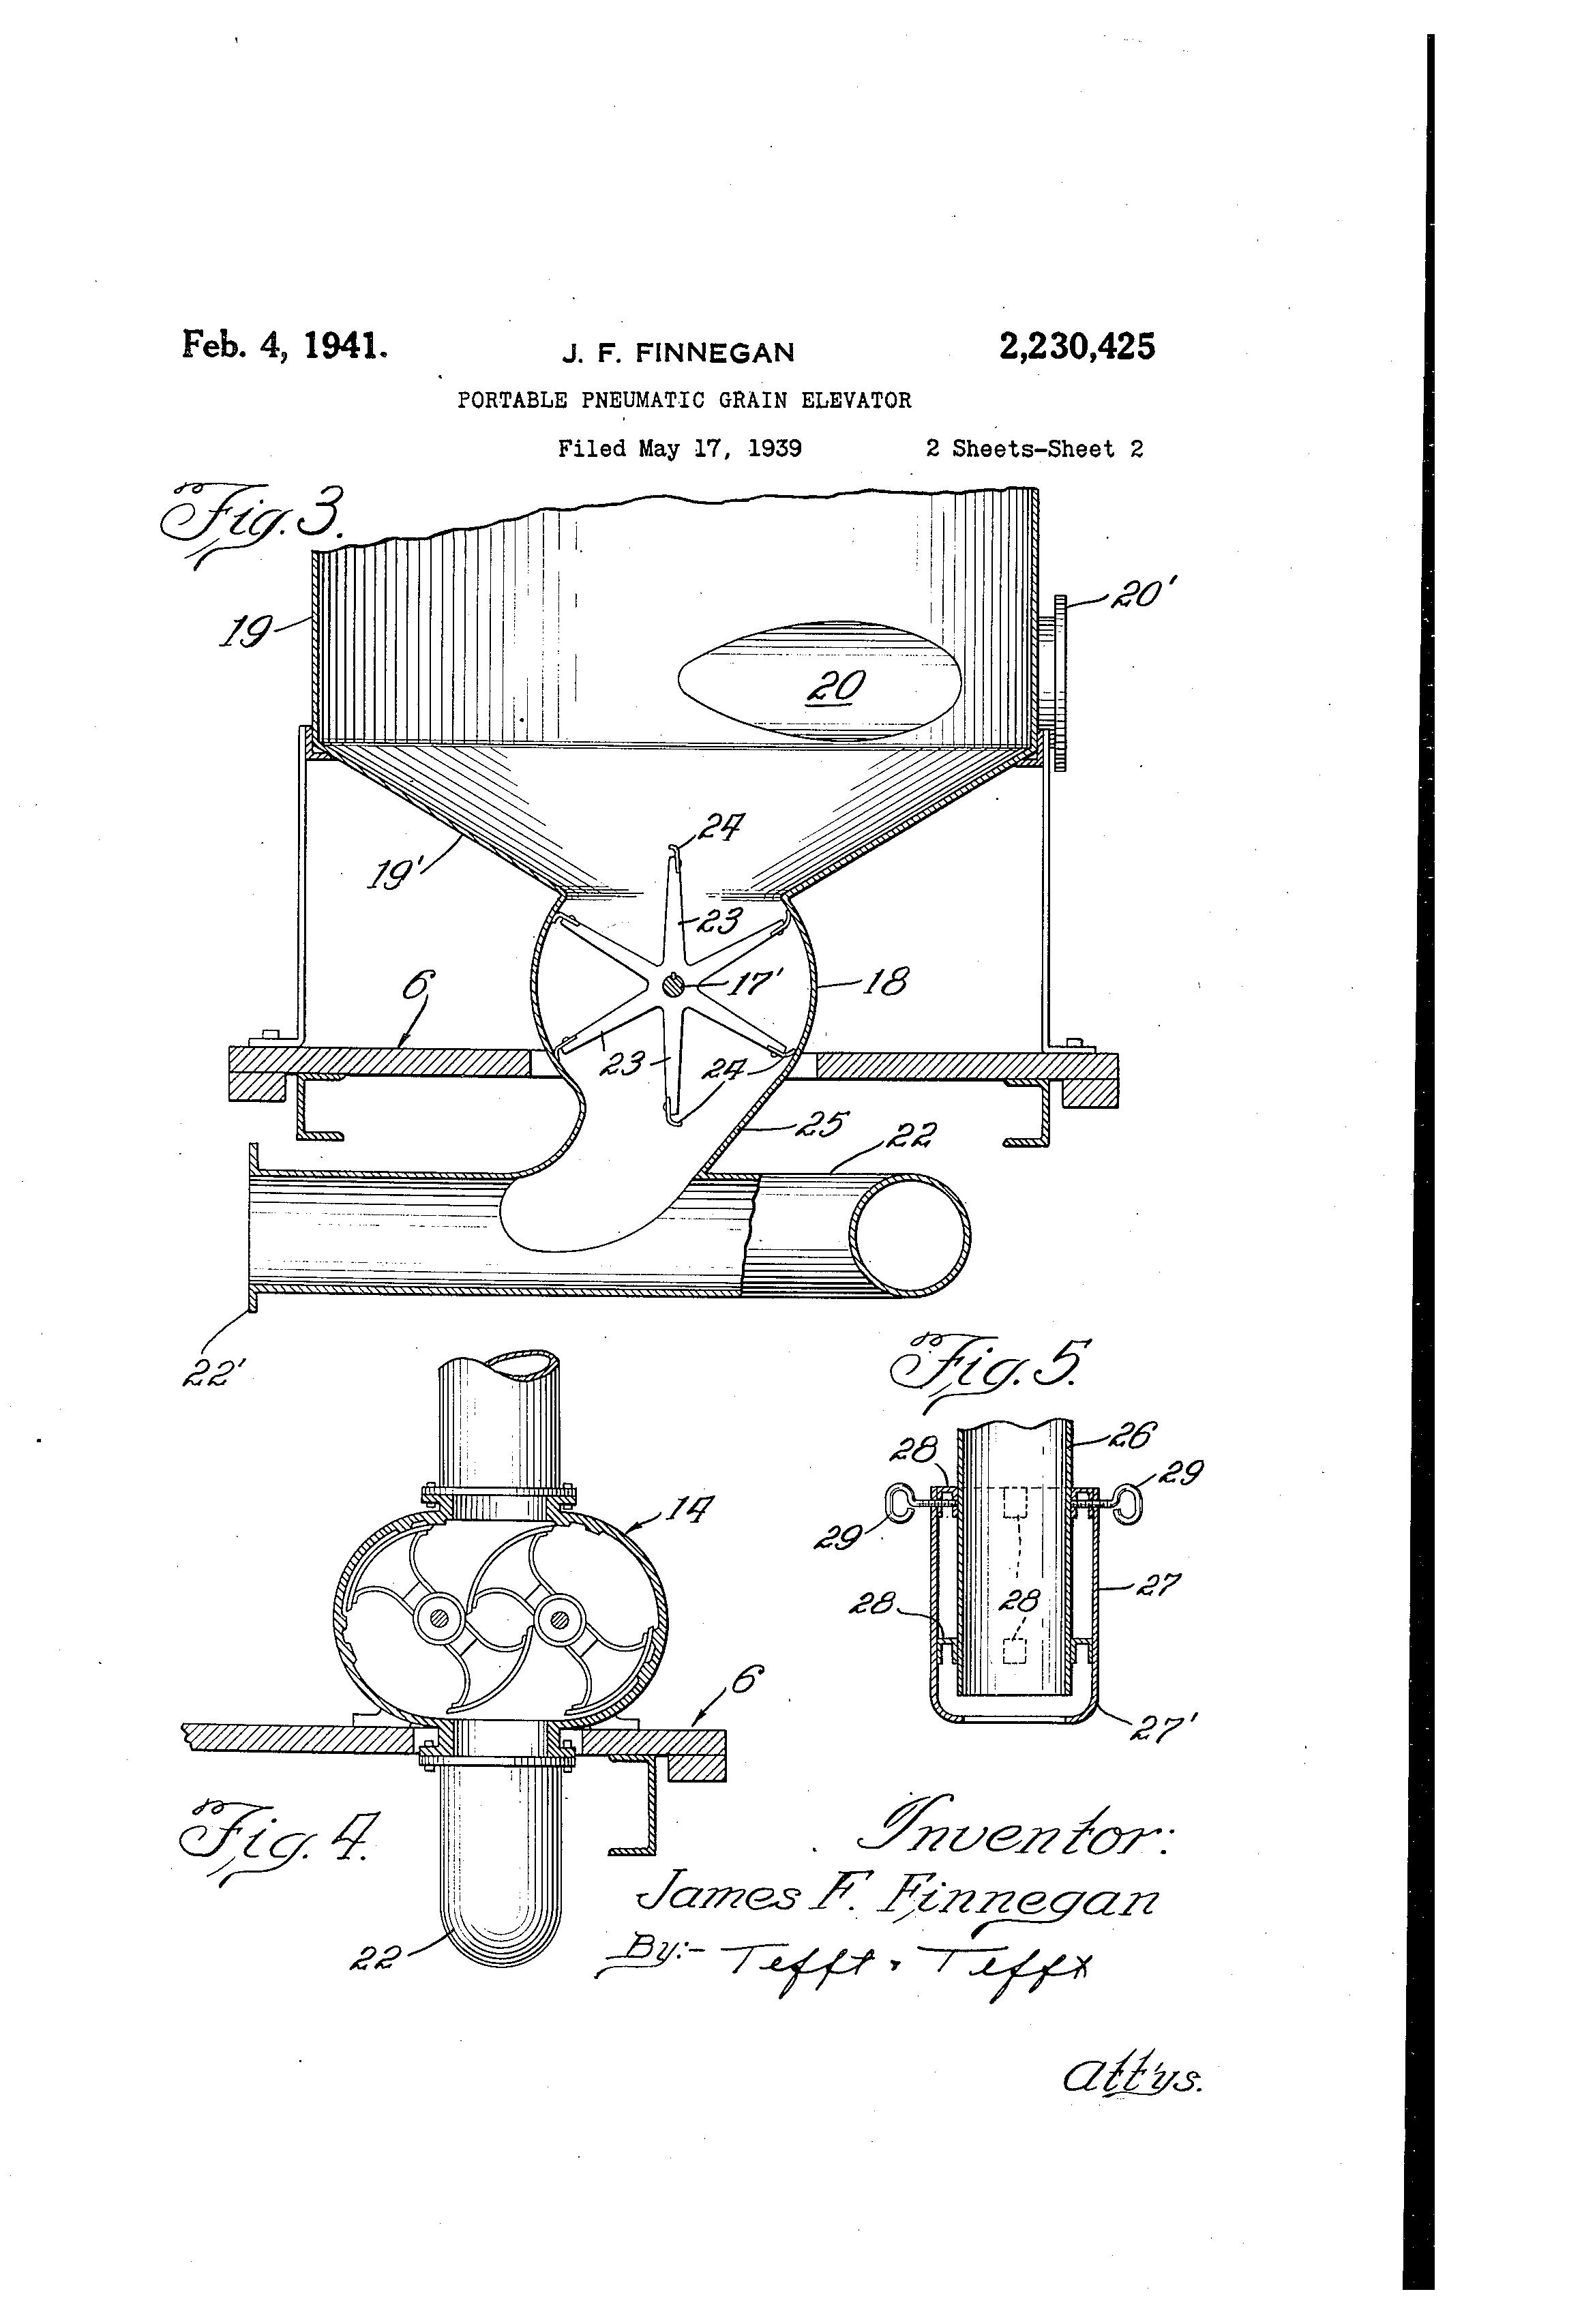 Brevet US2230425 - Portable pneumatic grain elevator